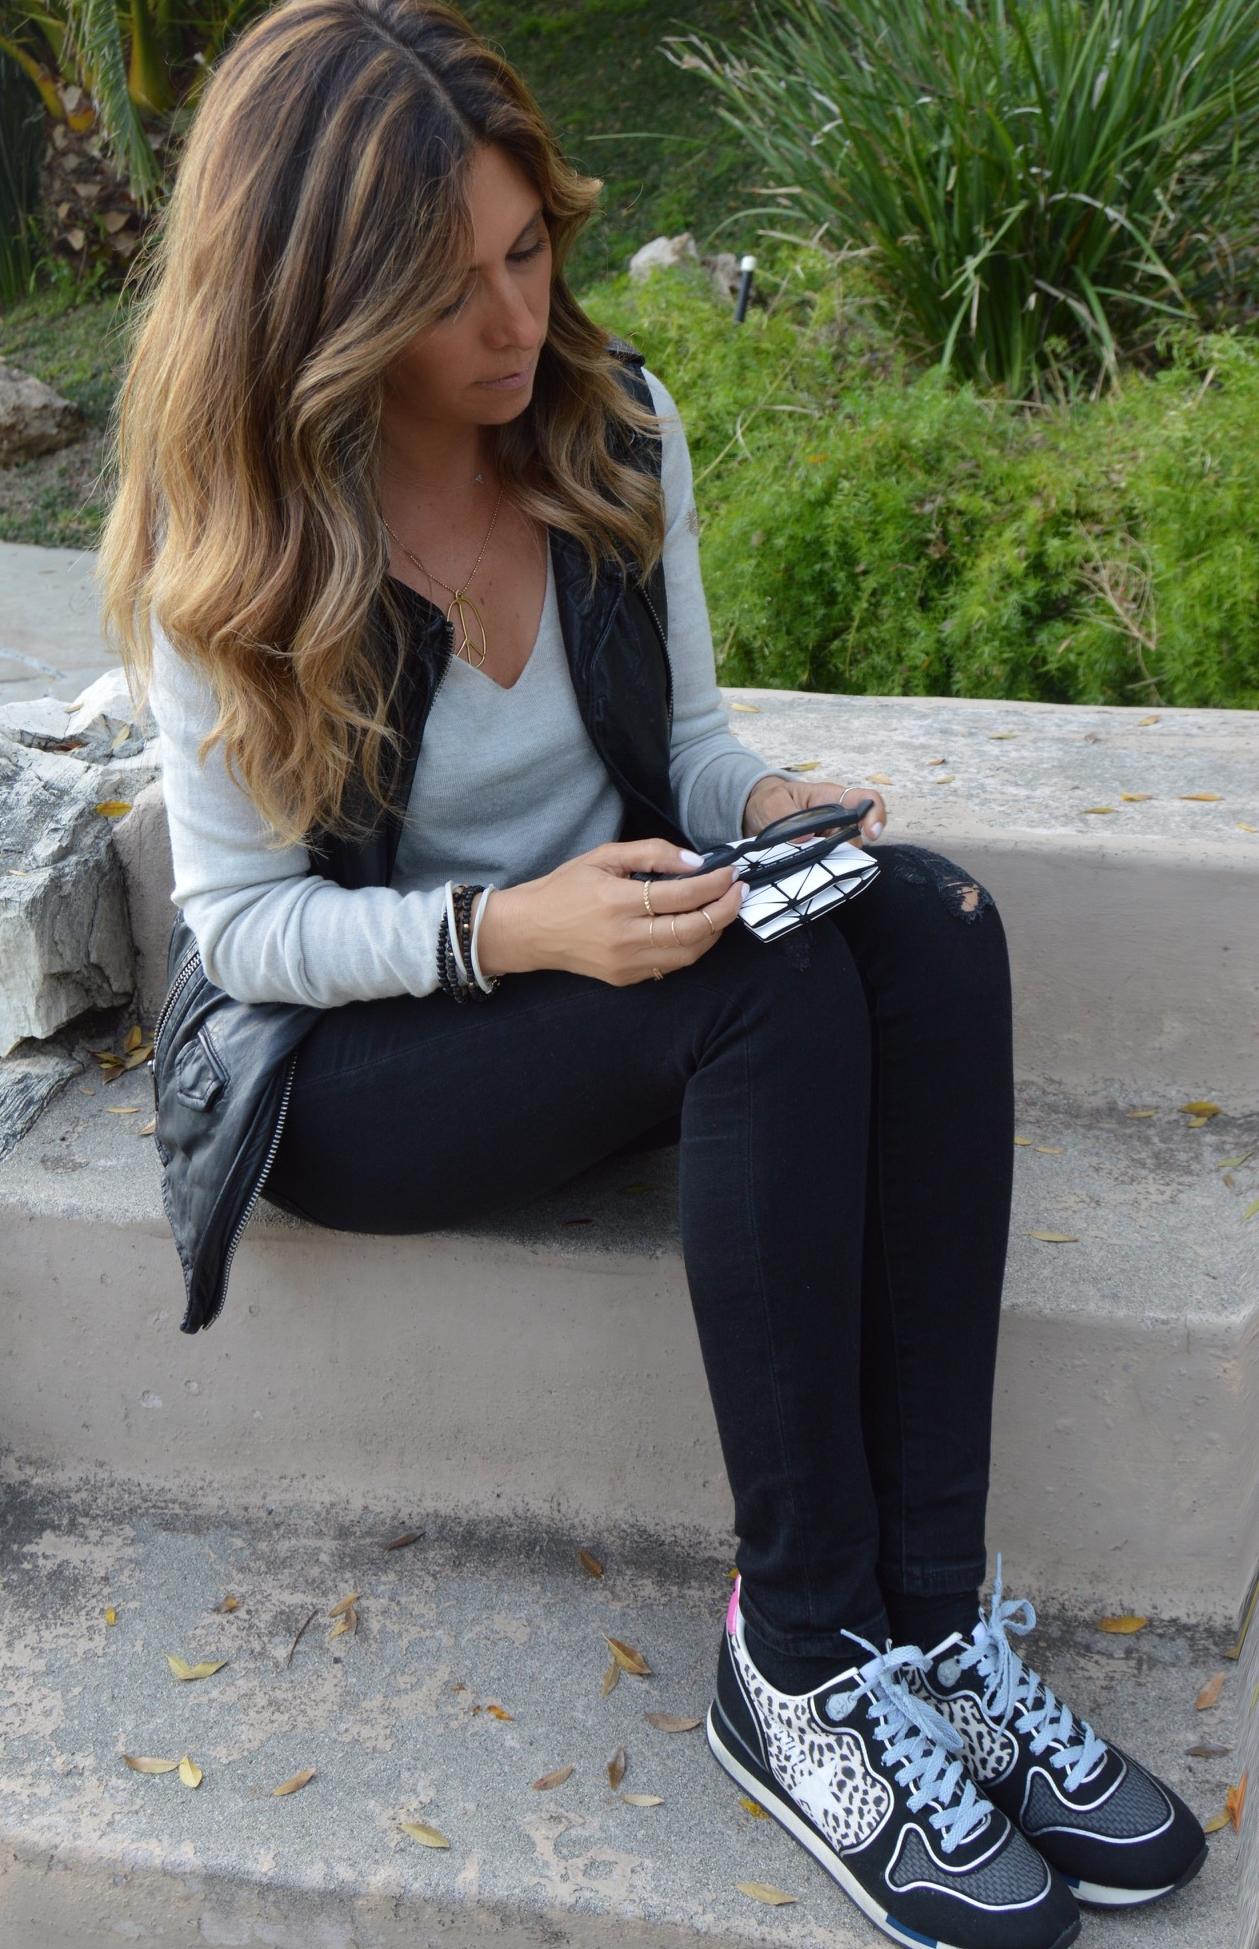 Golden Goose Running Sneakers (on sale!) , BLANKNYC leather vest , AG destressed black denim , Helmut Lang Sweater , Eyebobs Black glasses , Herschel Supply Co Beanie , Bao Bao Issey Miyake Card Holder